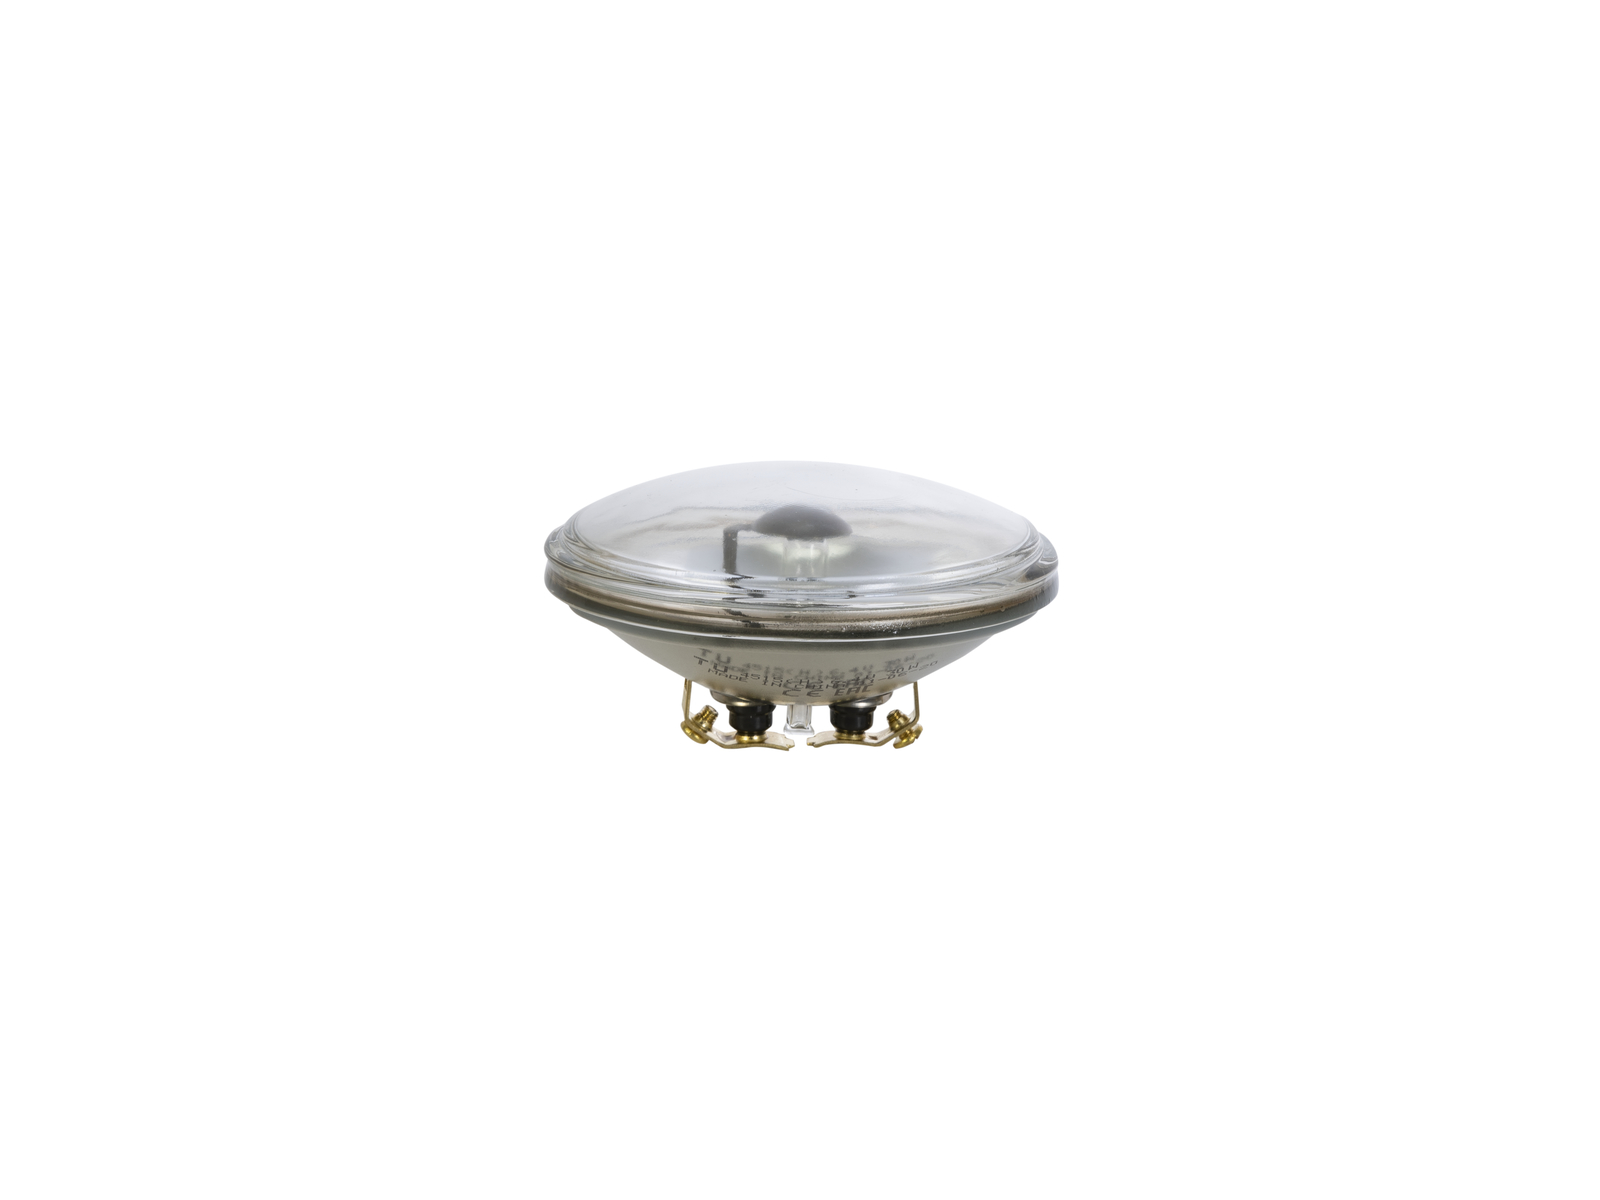 TUNGSRAM 4515 PAR-36 6,4V/30W VNSP 100h